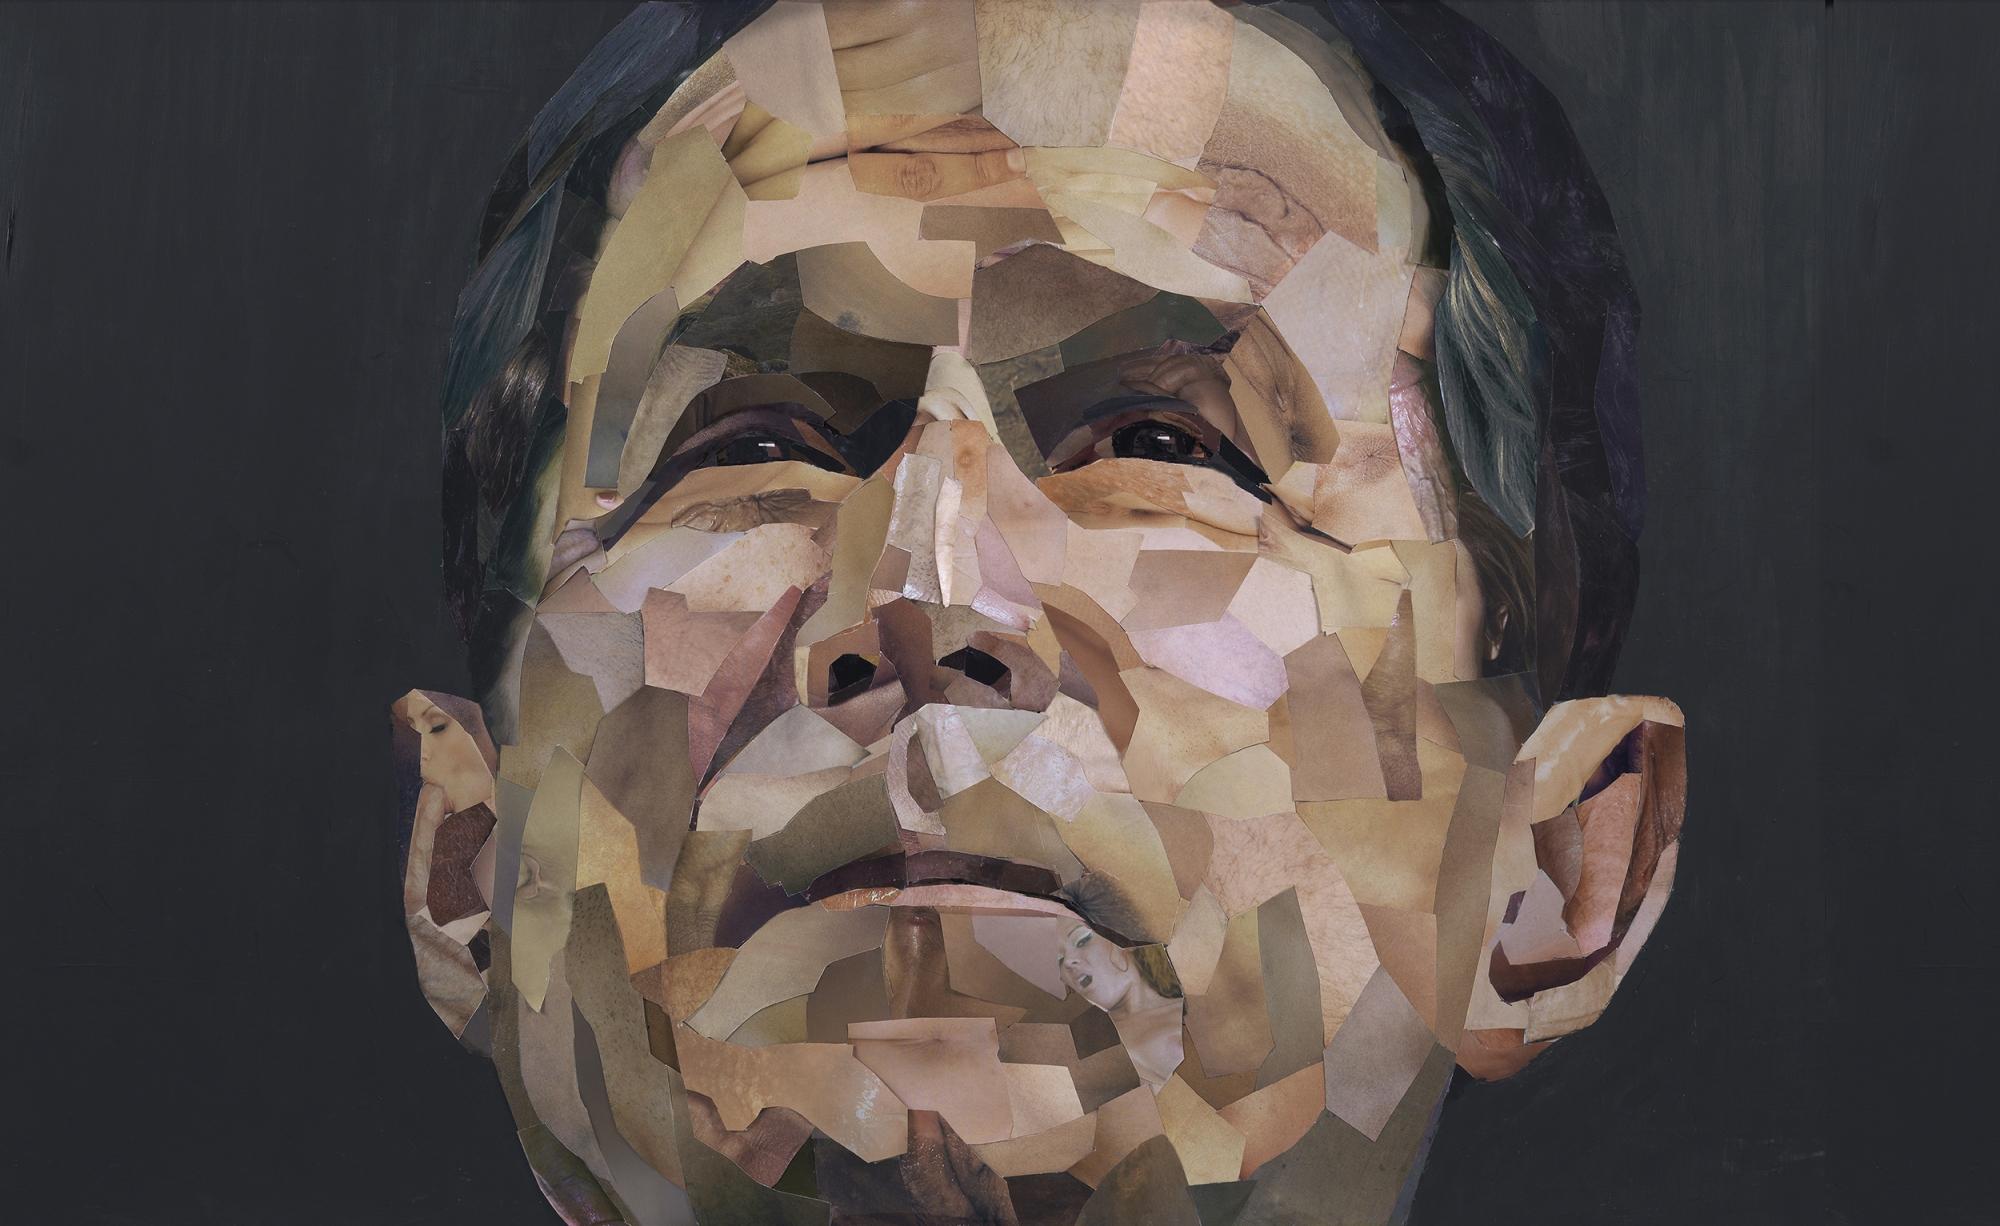 George_Bush_2000_1226_s.jpg